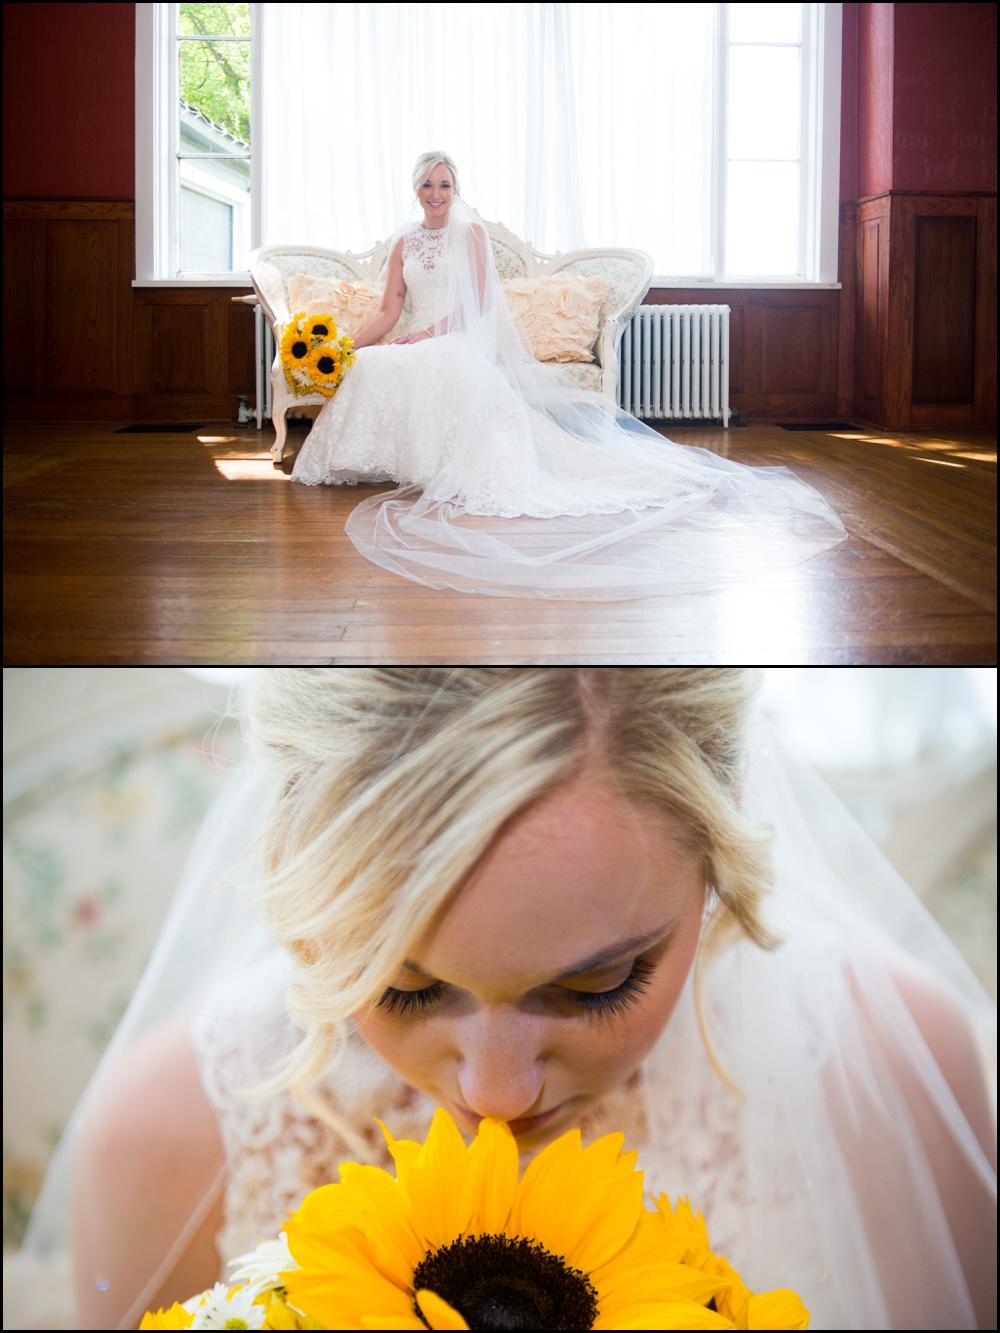 Mustard Seed Garden Wedding Pictures-007.jpg